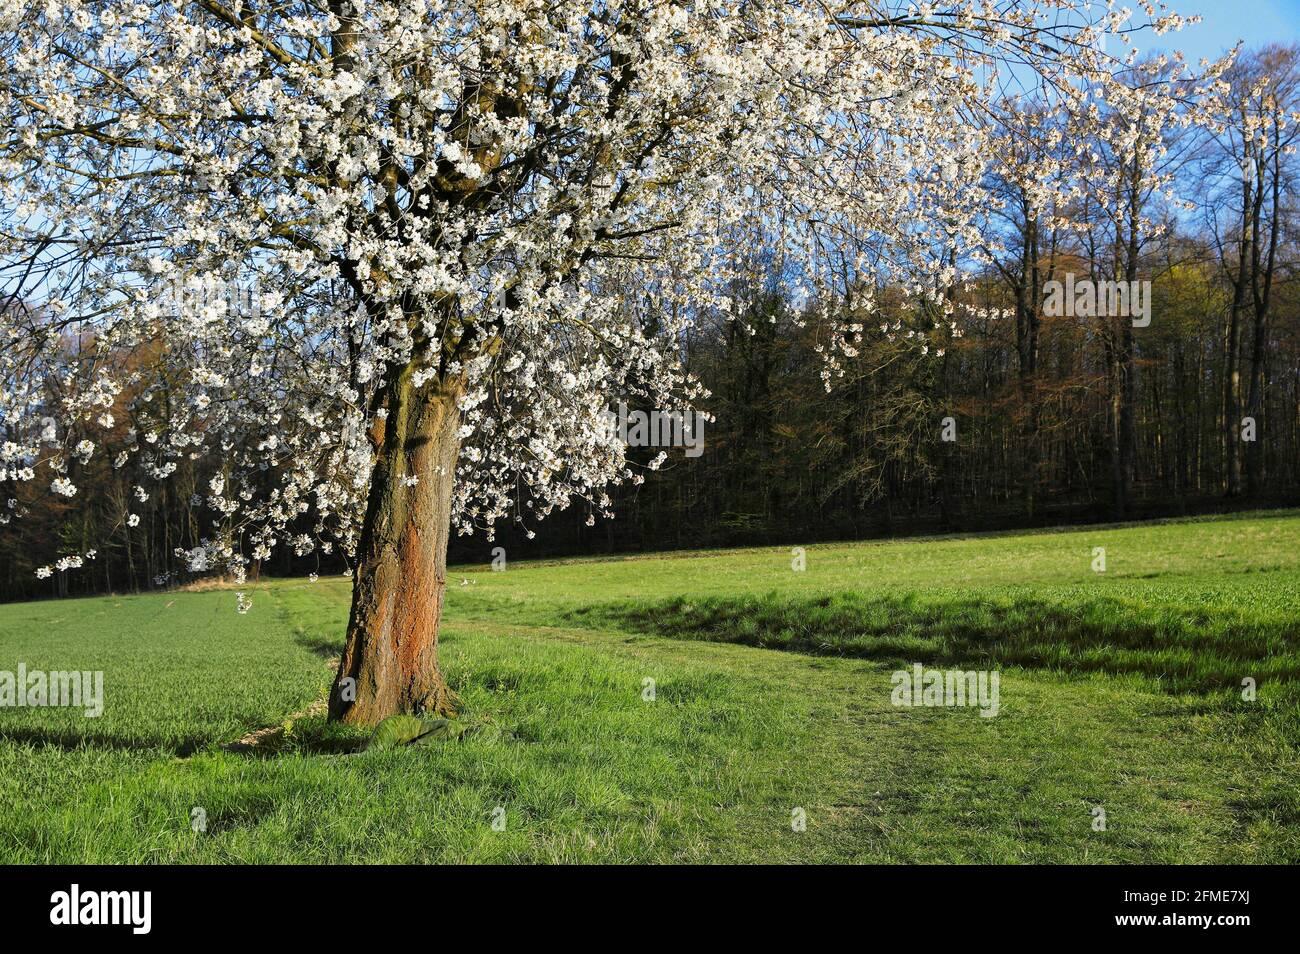 Naturkunst: Kirschblütenphotoshooting mit Modell Lana als Grasbowpainting im Groeninger Feld in Hameln, am 5. Mai 2021 - Bodypainting Künstler: Jörg Duesterwald Stockfoto